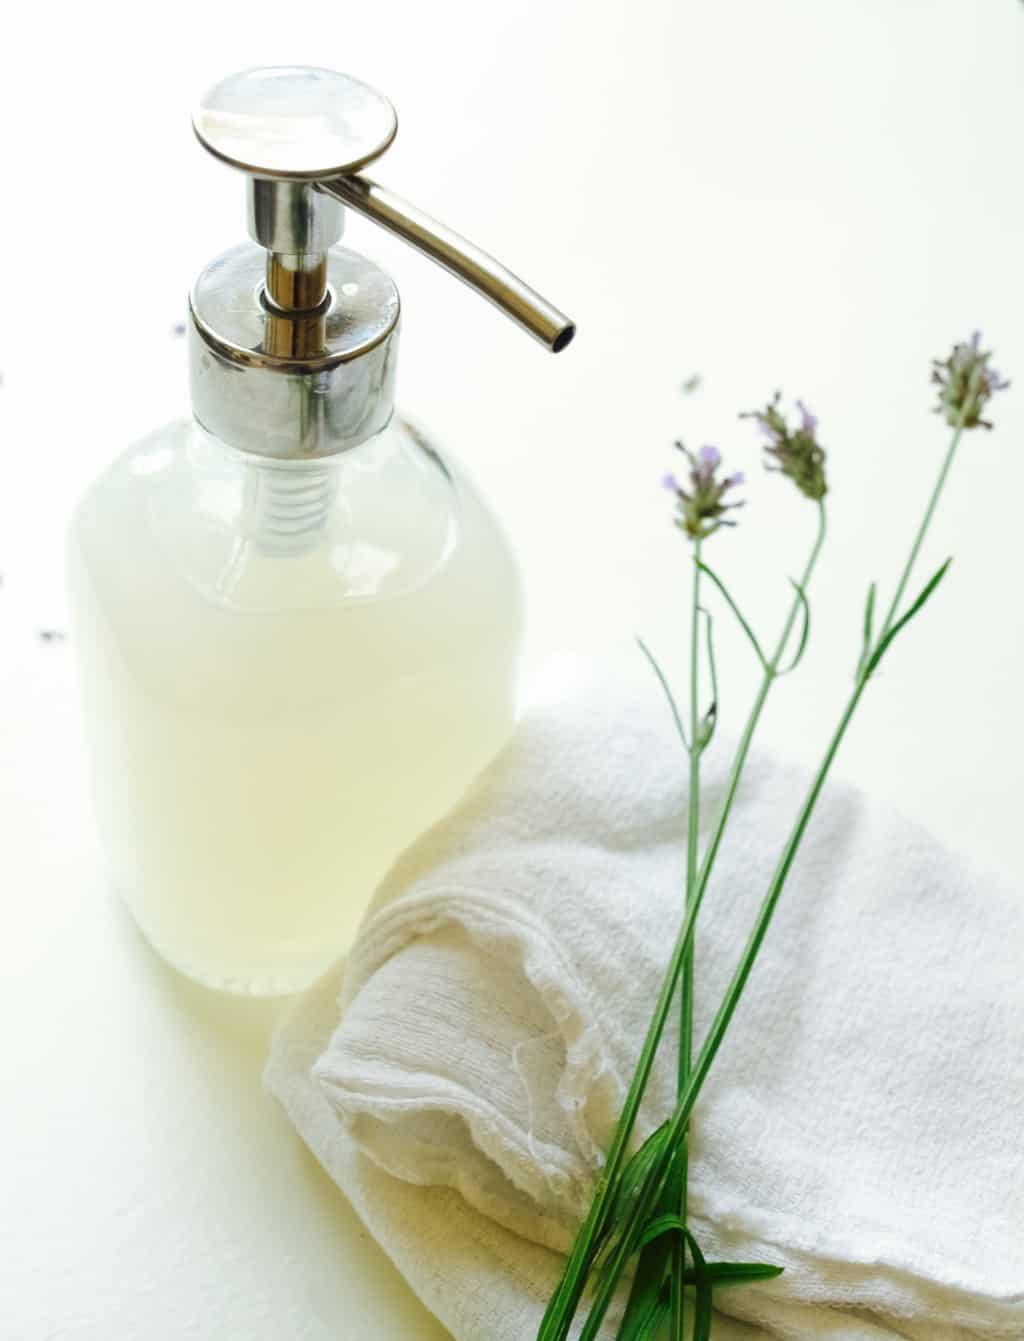 Quick and easy liquid hand soap recipe